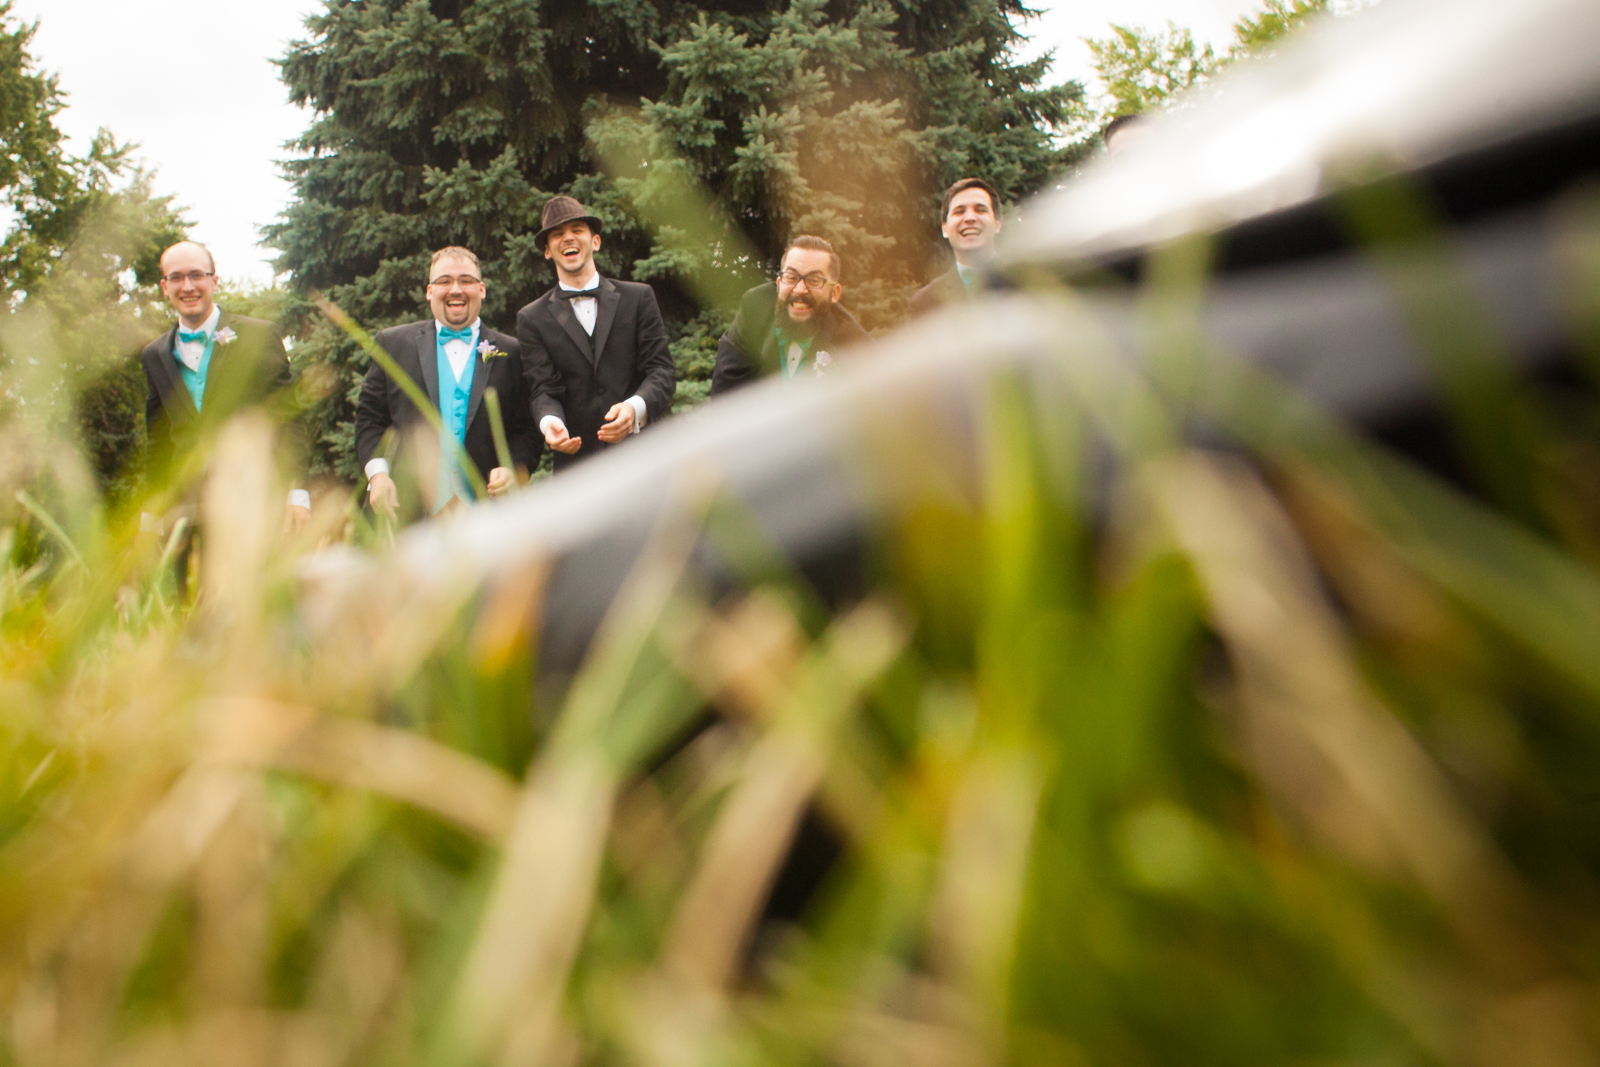 naperville-wedding-photography-51.jpg